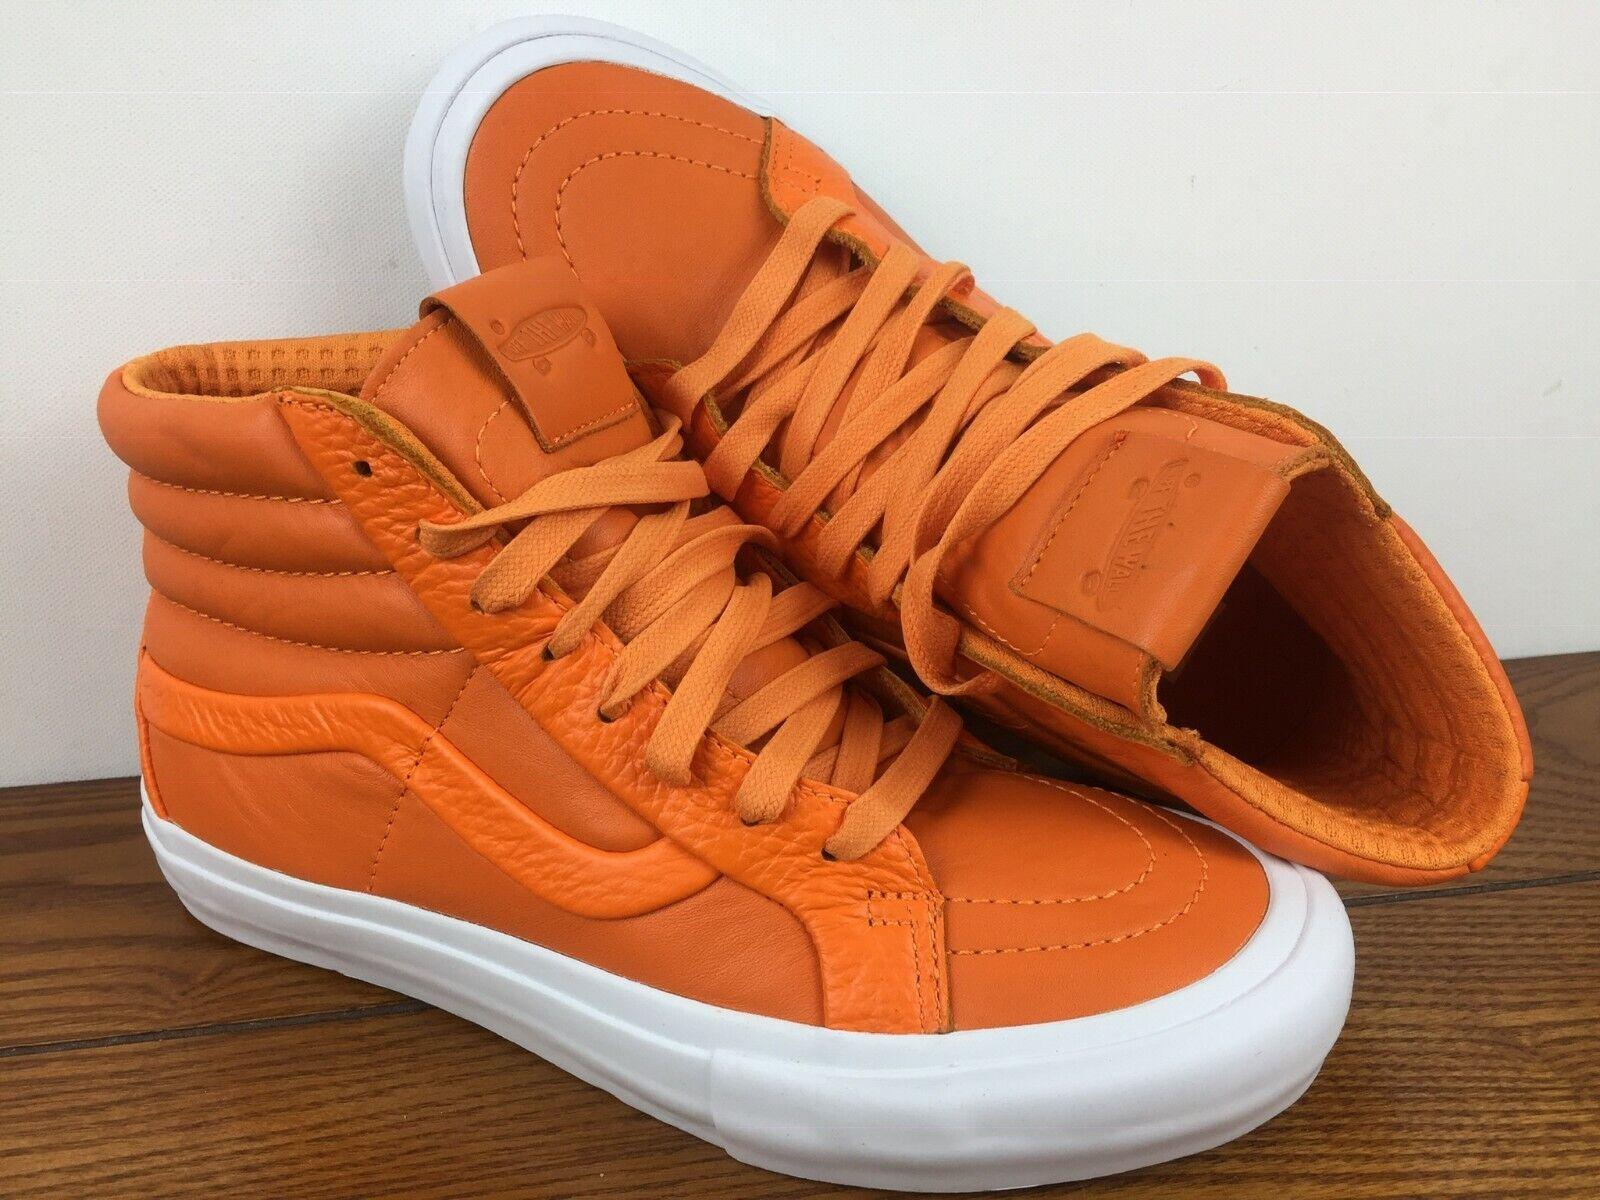 VANS New Sk8-Hi Reissue ST Premium Leather Mens Talla 12 ATM Glory